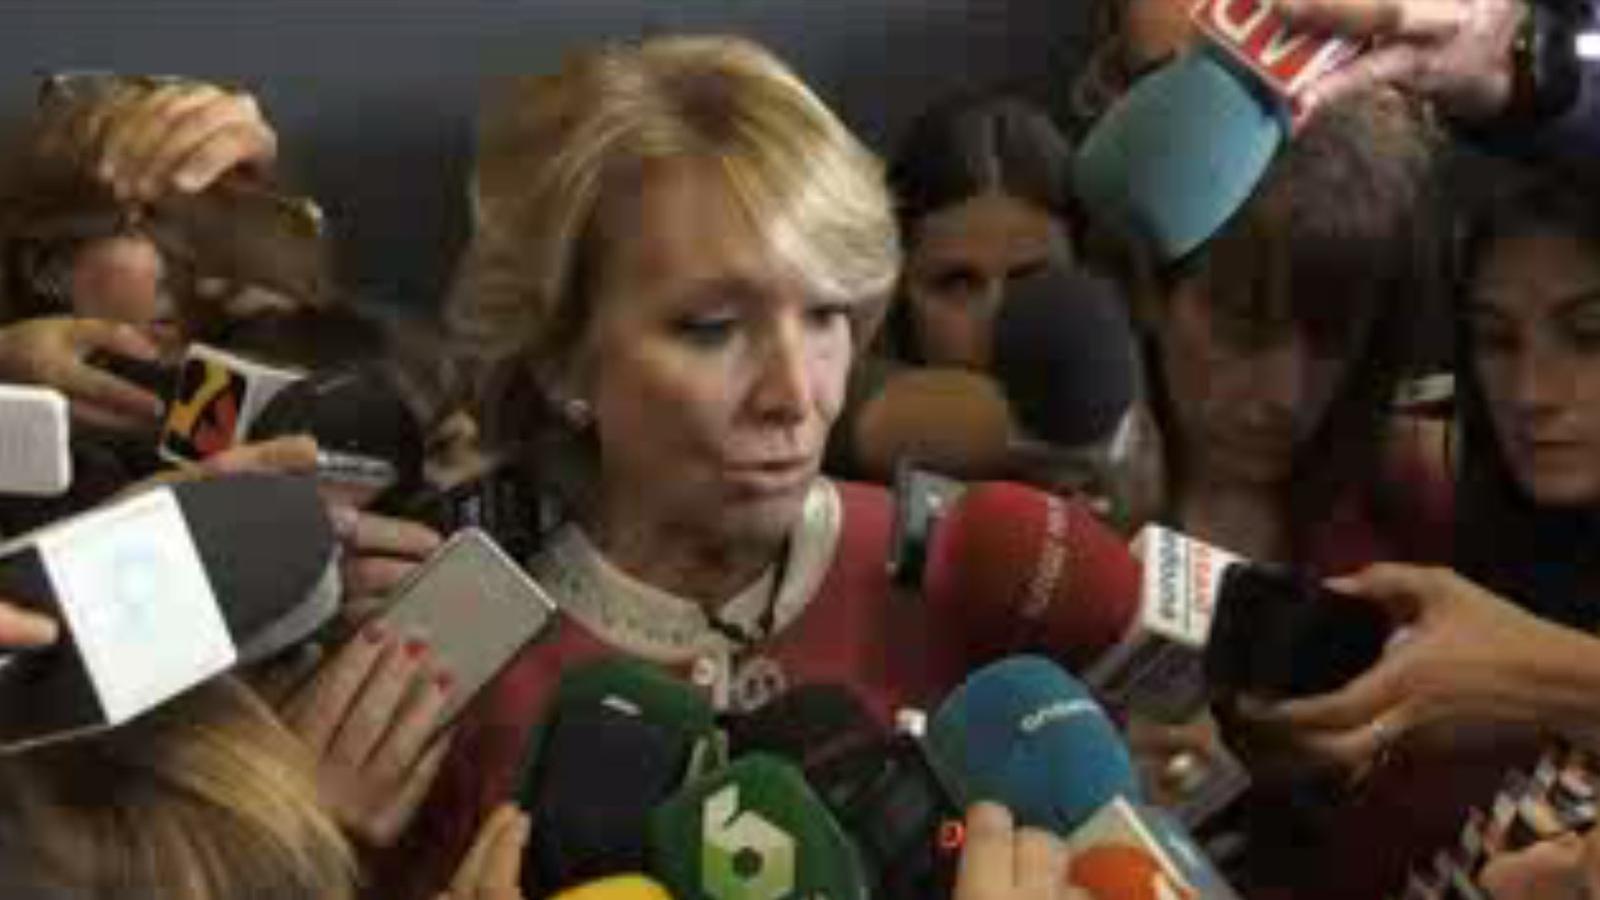 Aguirre s'emociona a l'hora de parlar de la investigació a Ignacio González